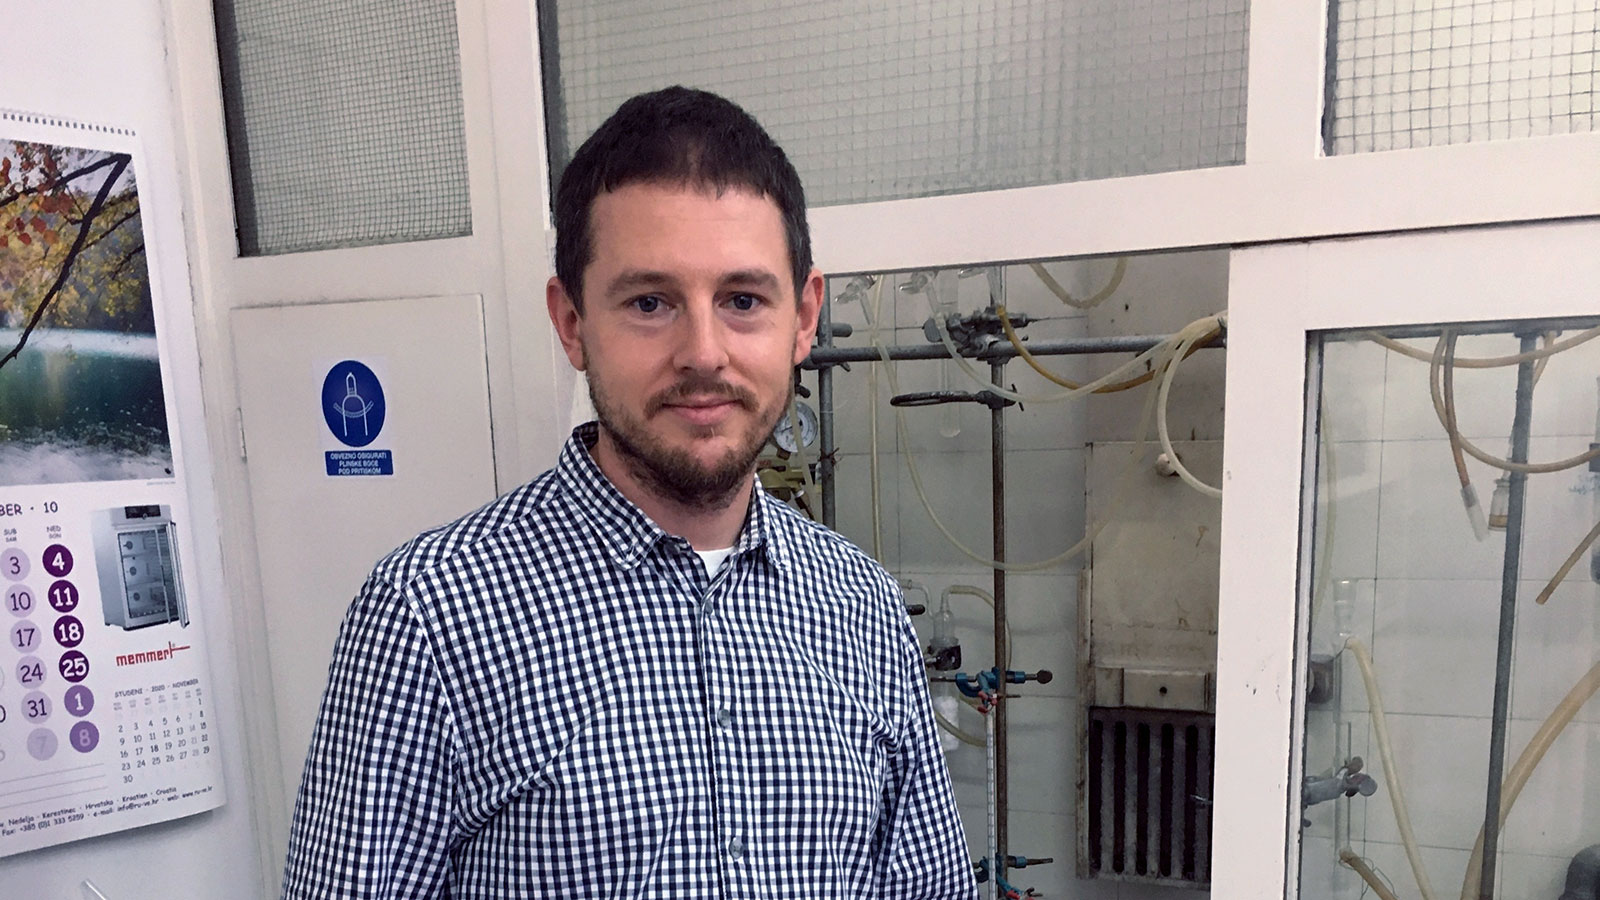 IRB chemists develop new method for waste PET degradation